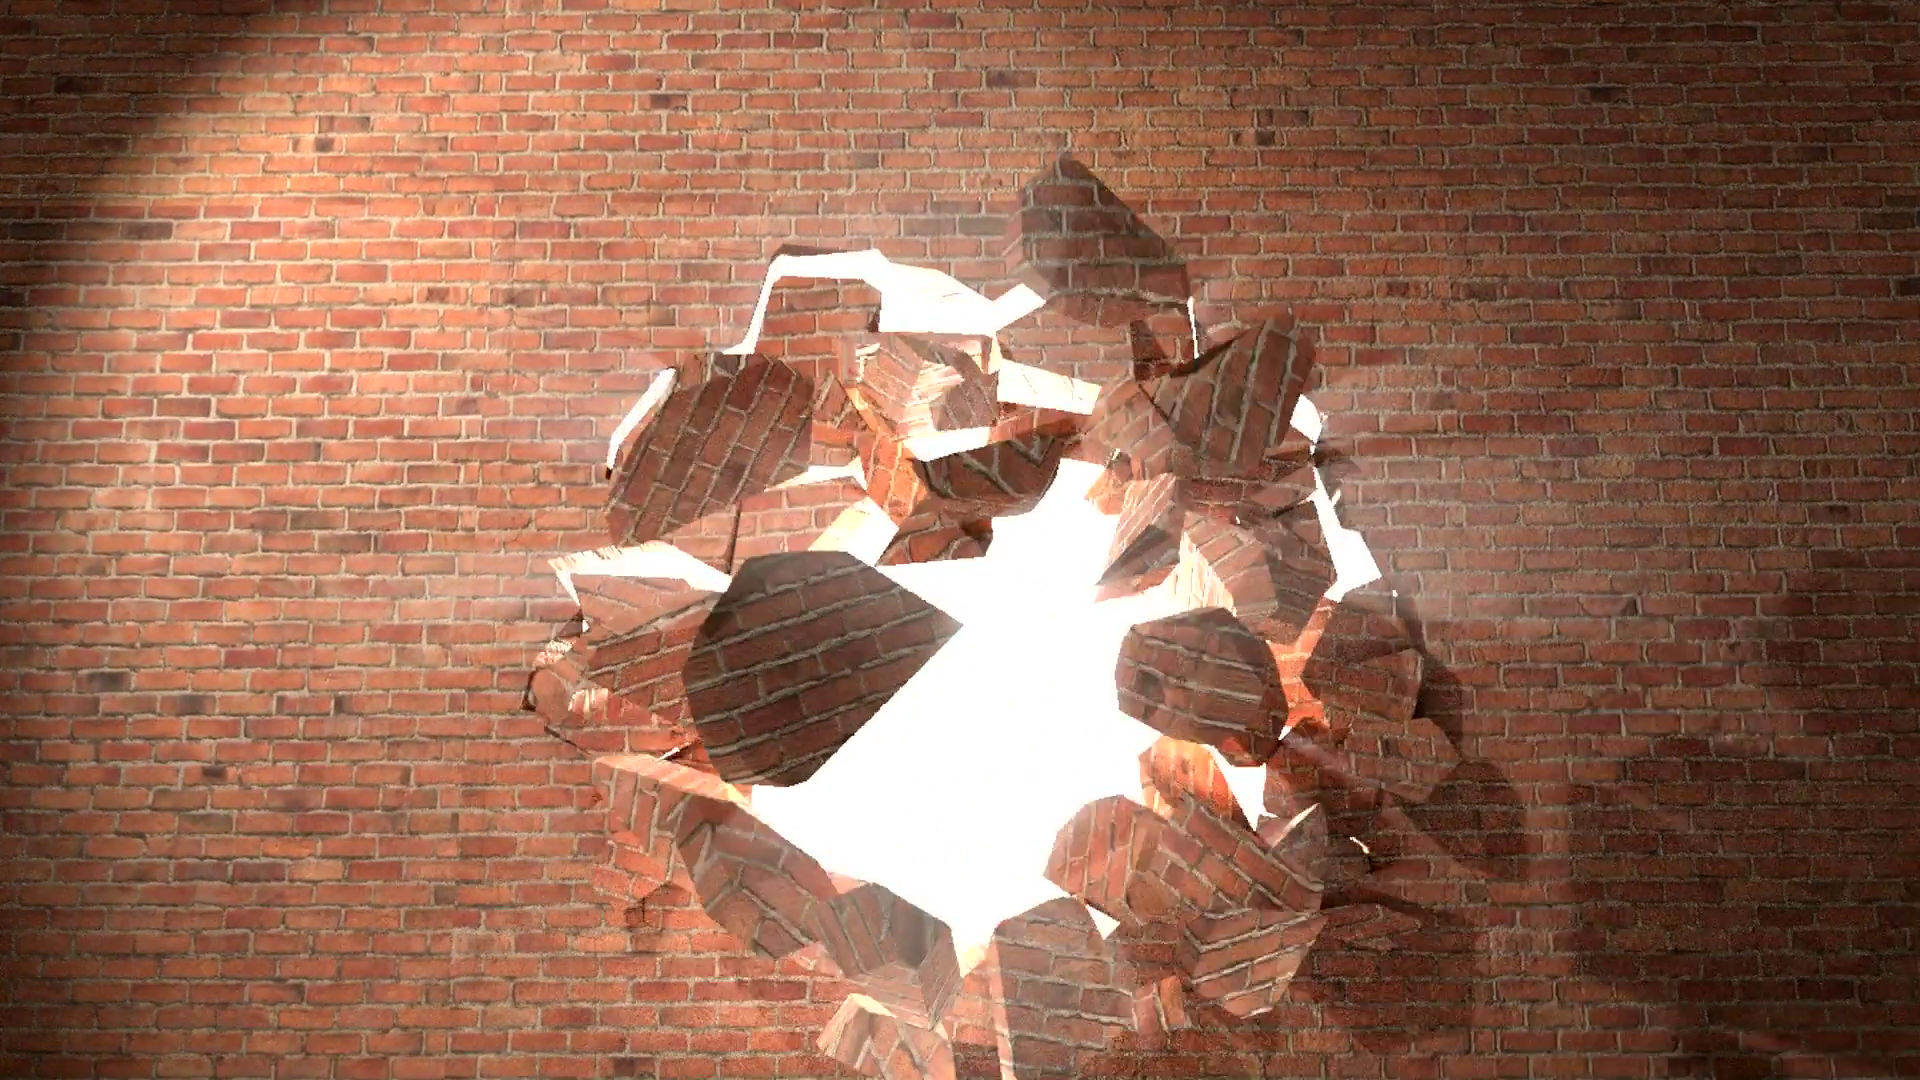 Breaking Through Brick Wall PNG - 162453